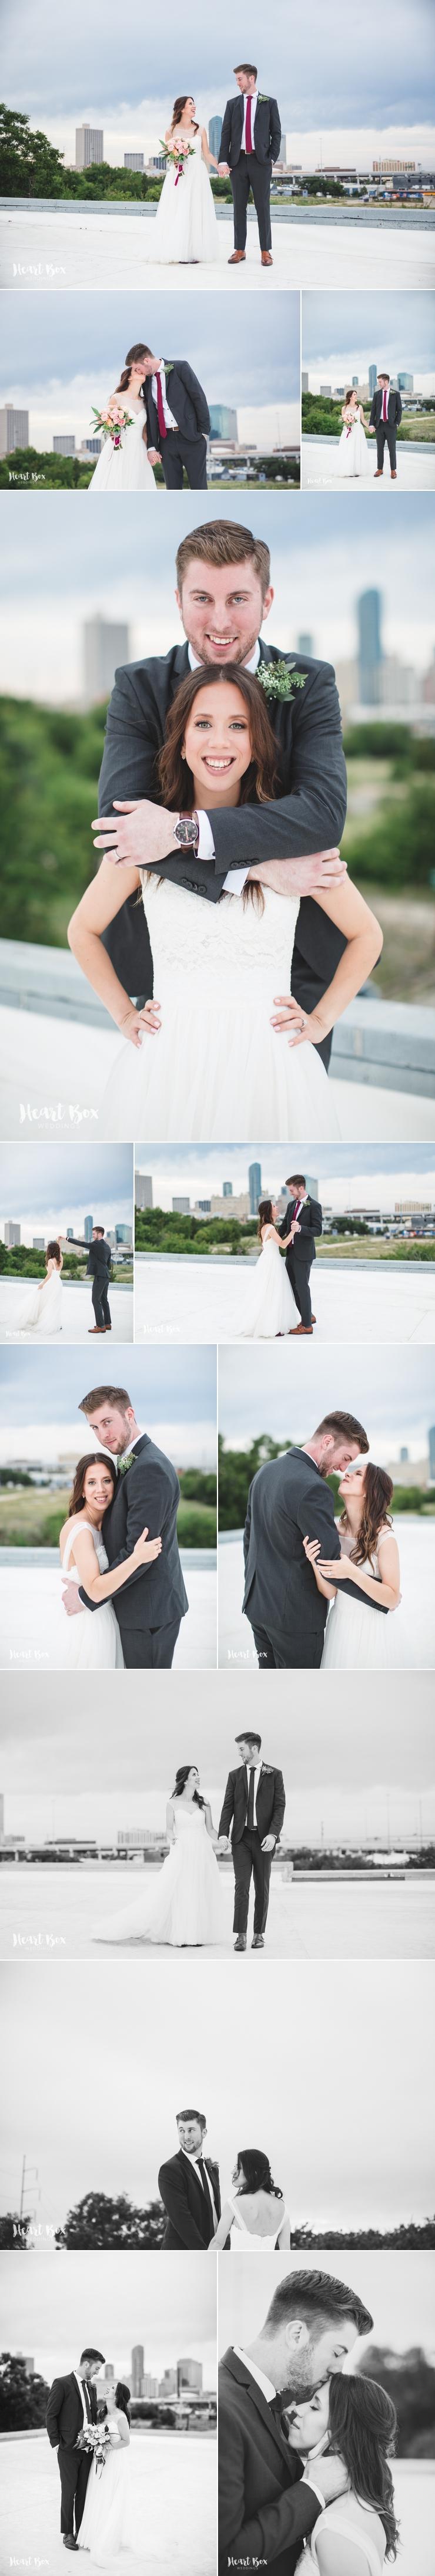 Hicks Wedding 19.jpg